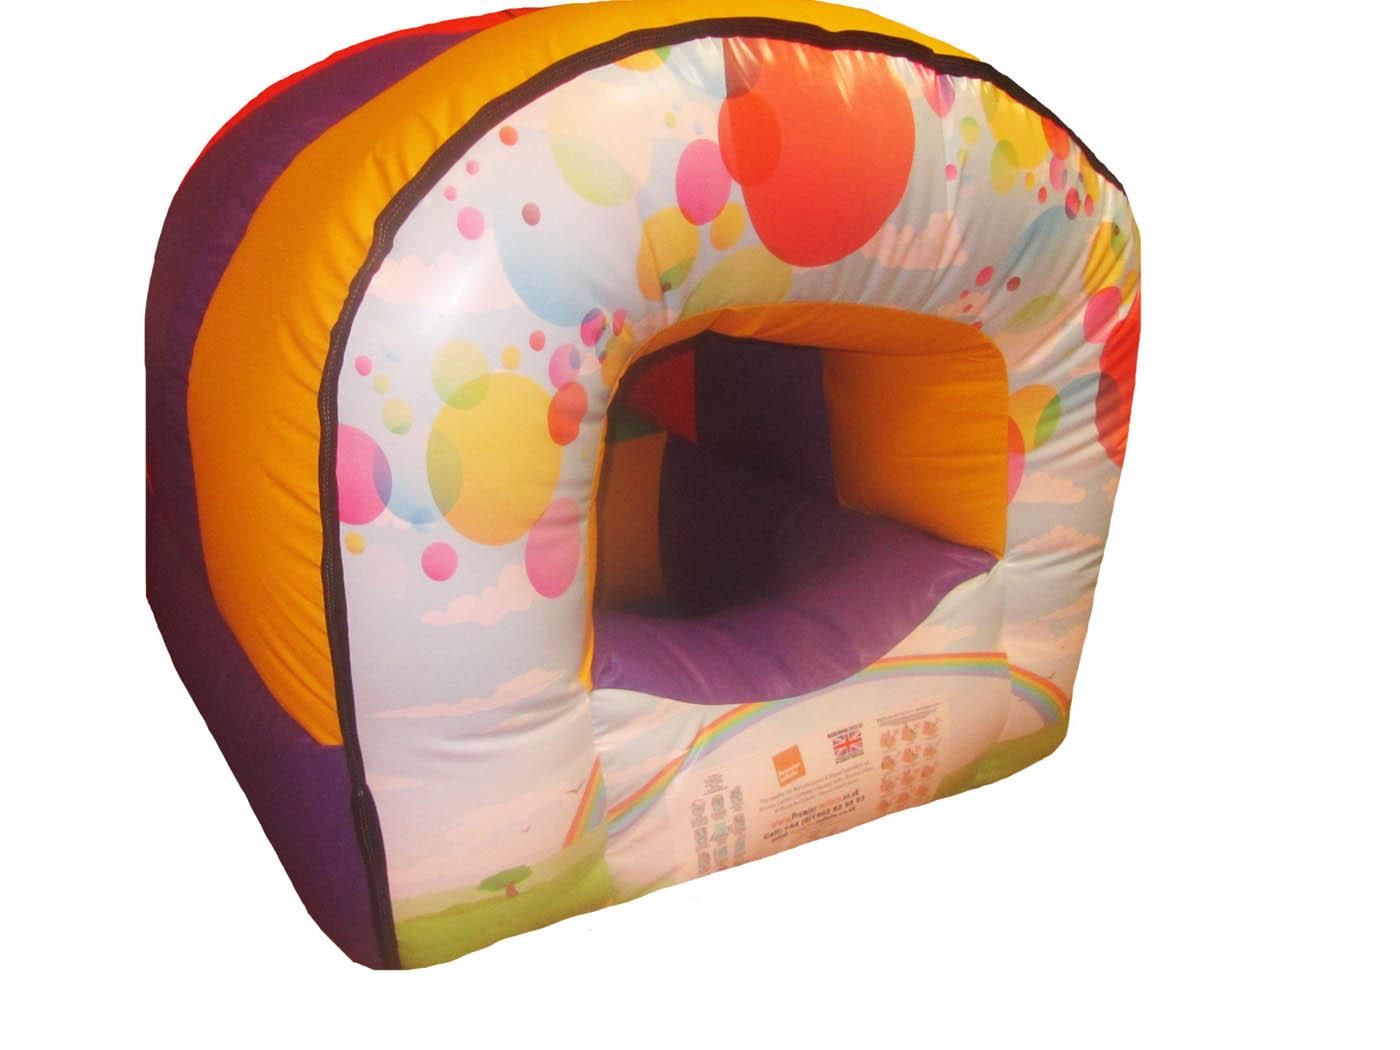 Sensory Inflatable Soft Play Dome